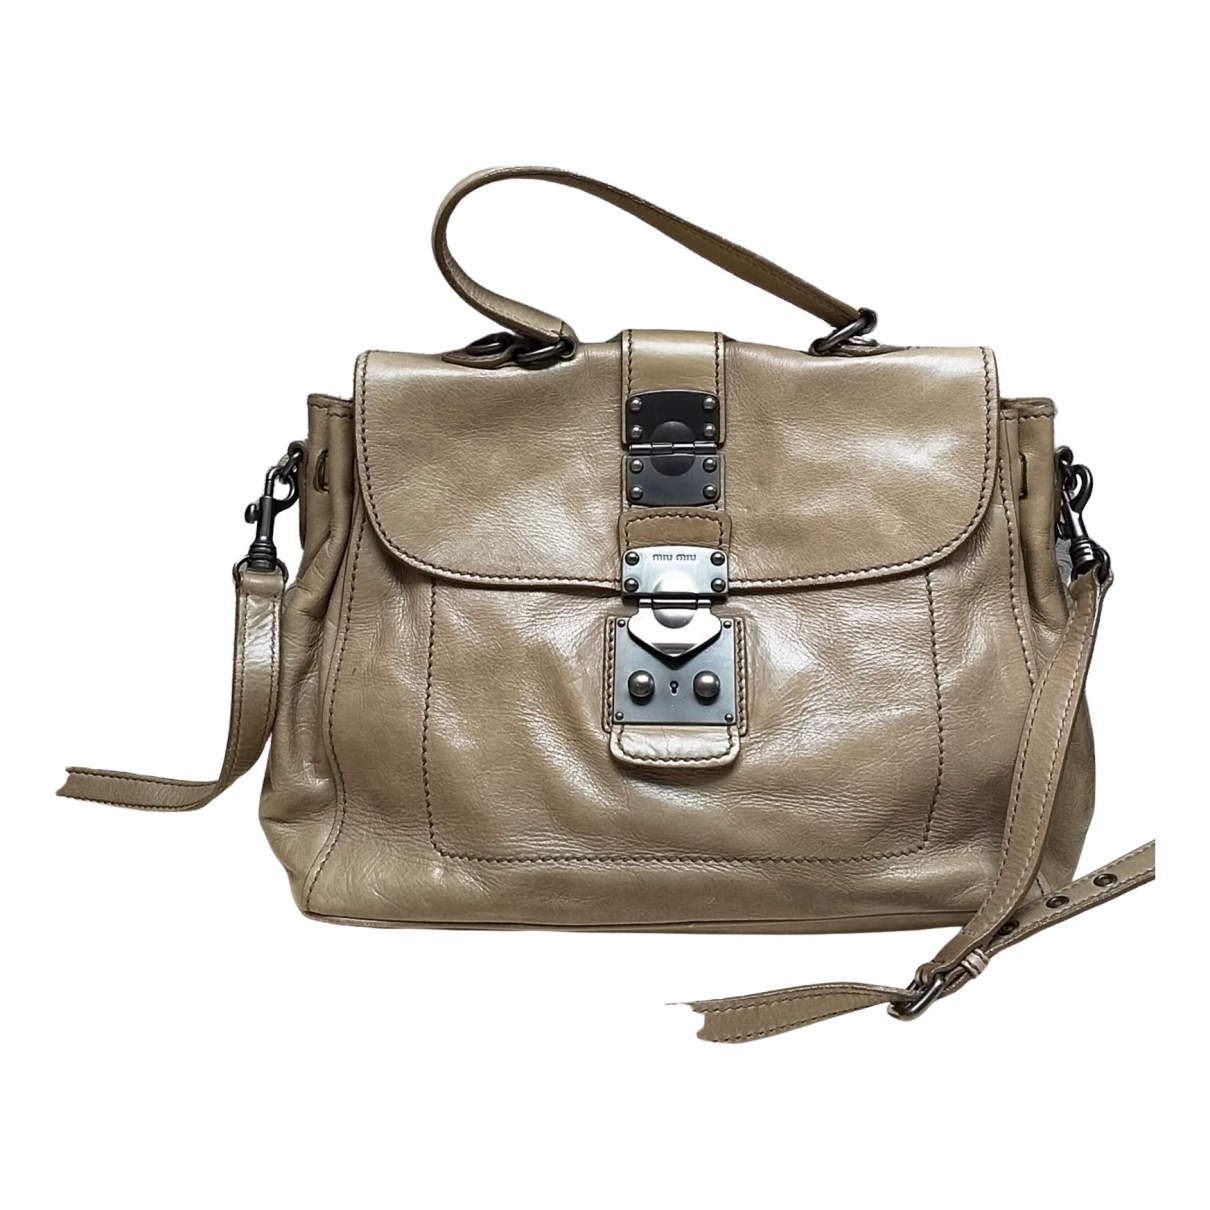 Miu Miu \N Leather handbag for Women \N